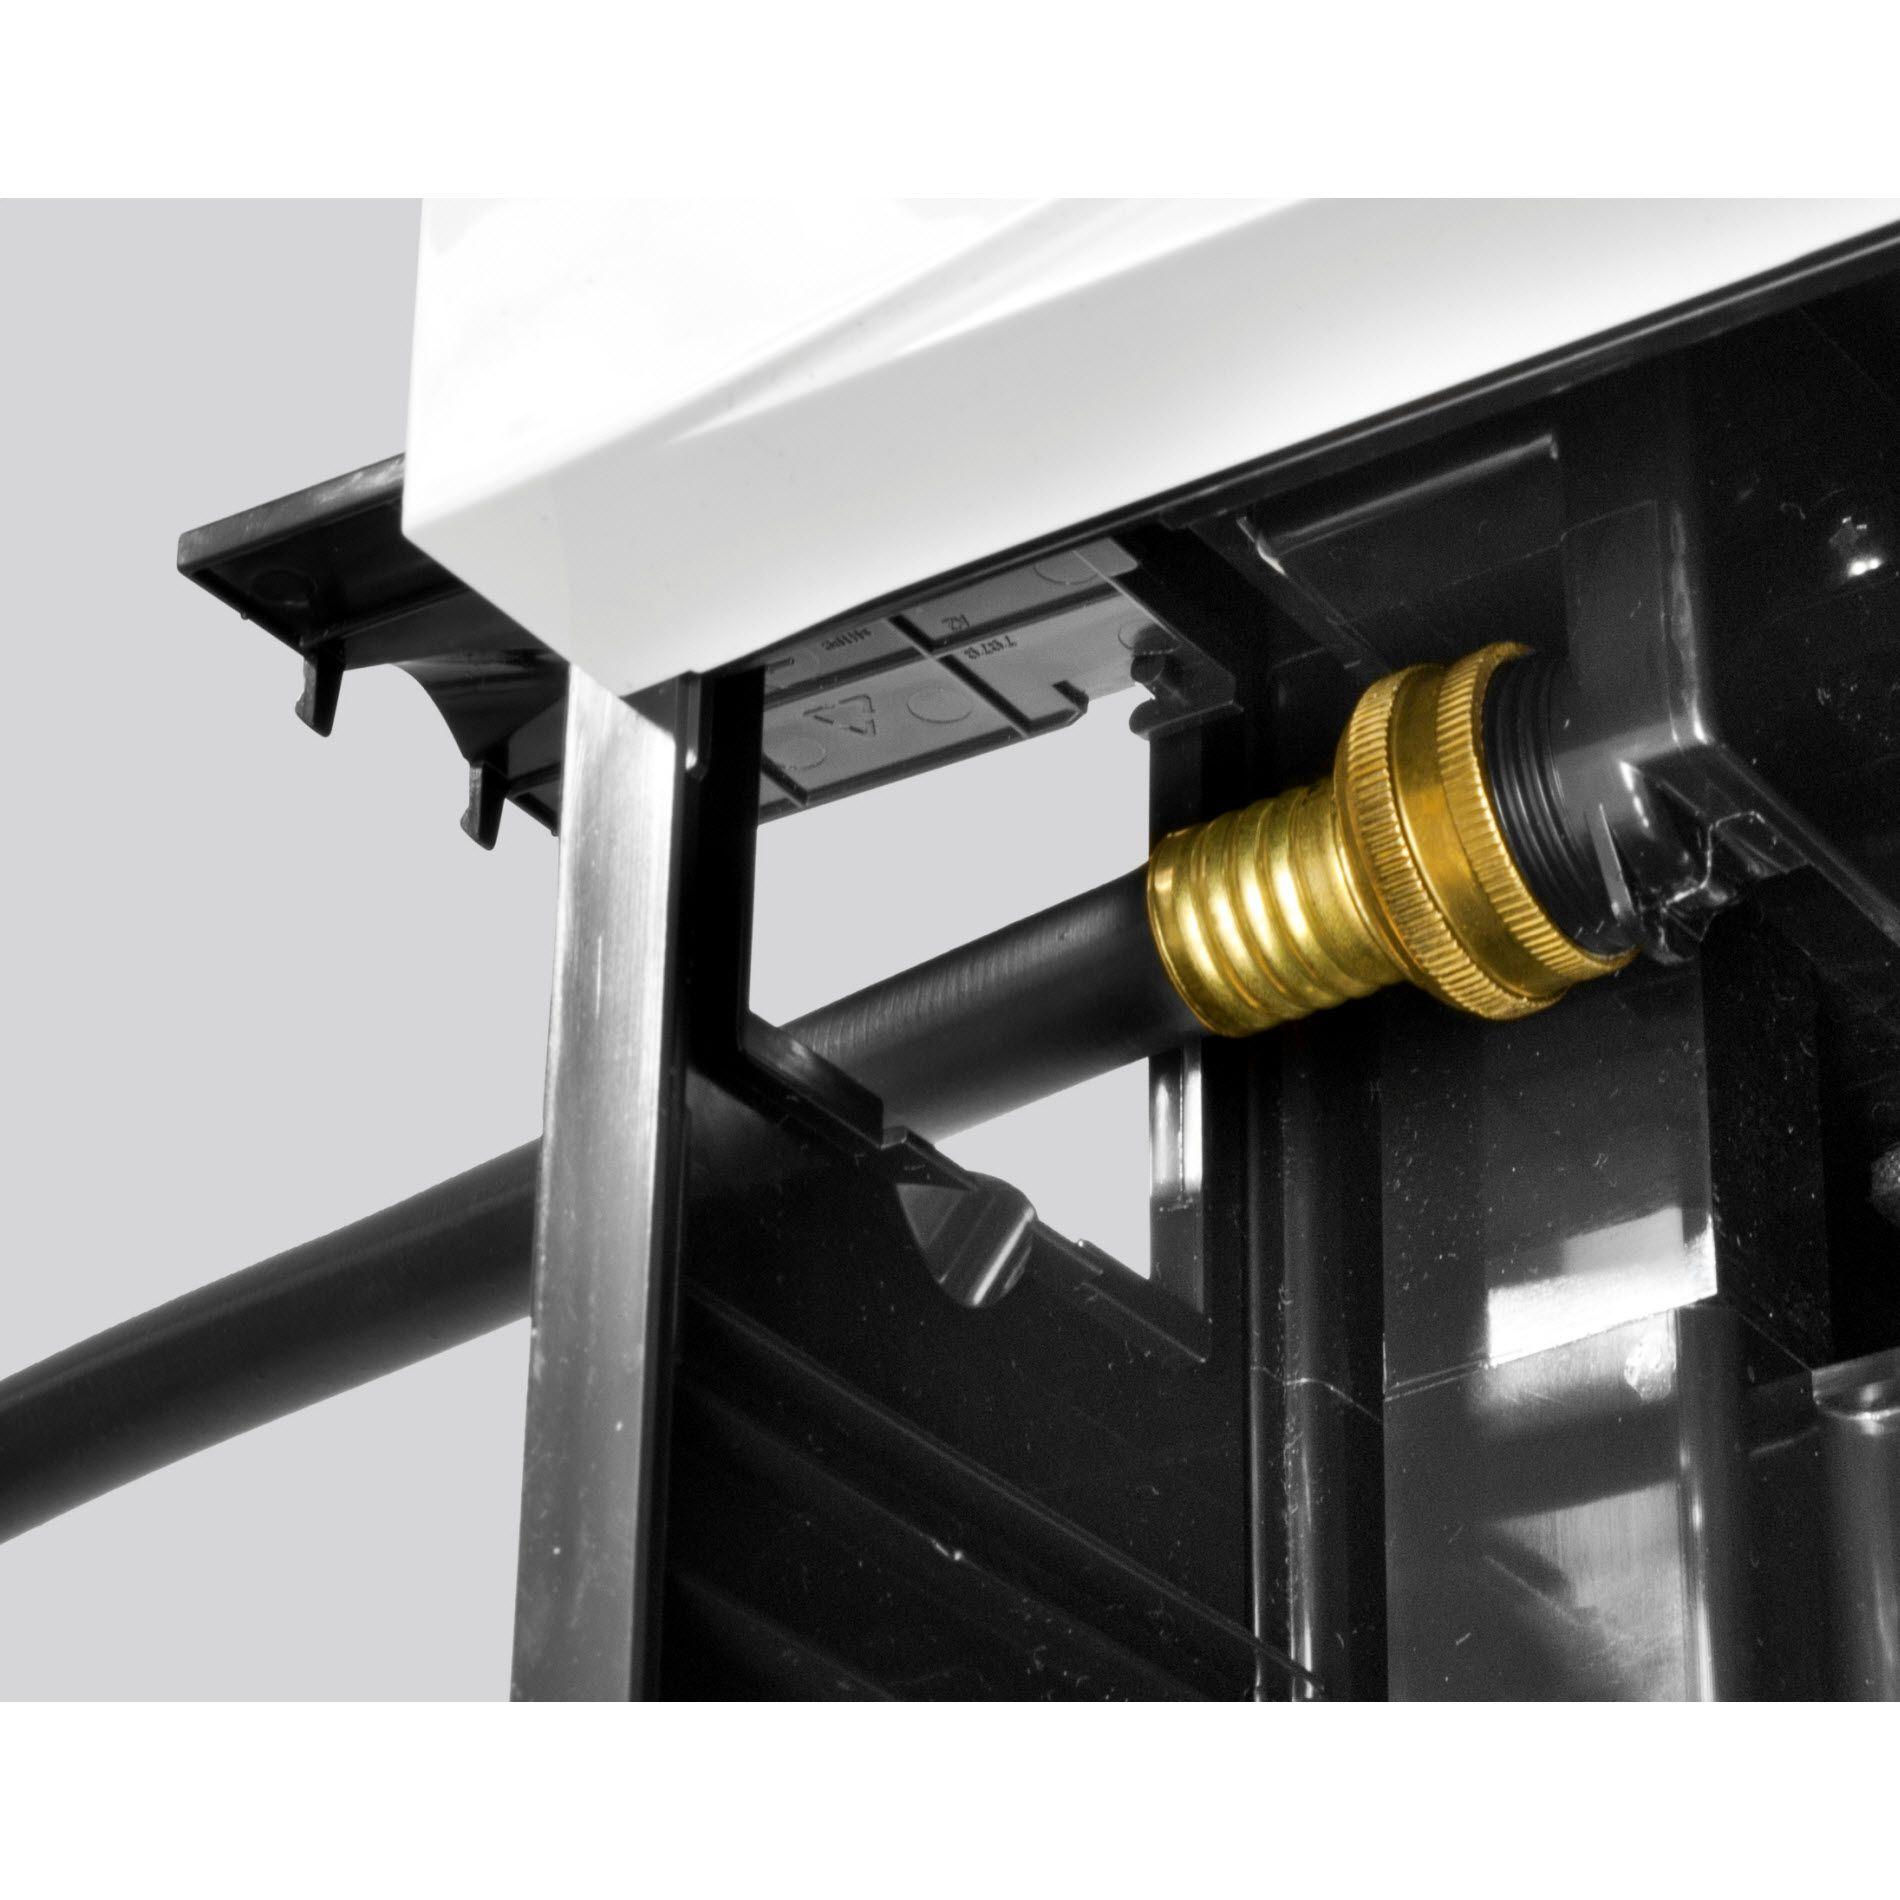 Kenmore 30-pt. Dehumidifier w/ Electronic Controls